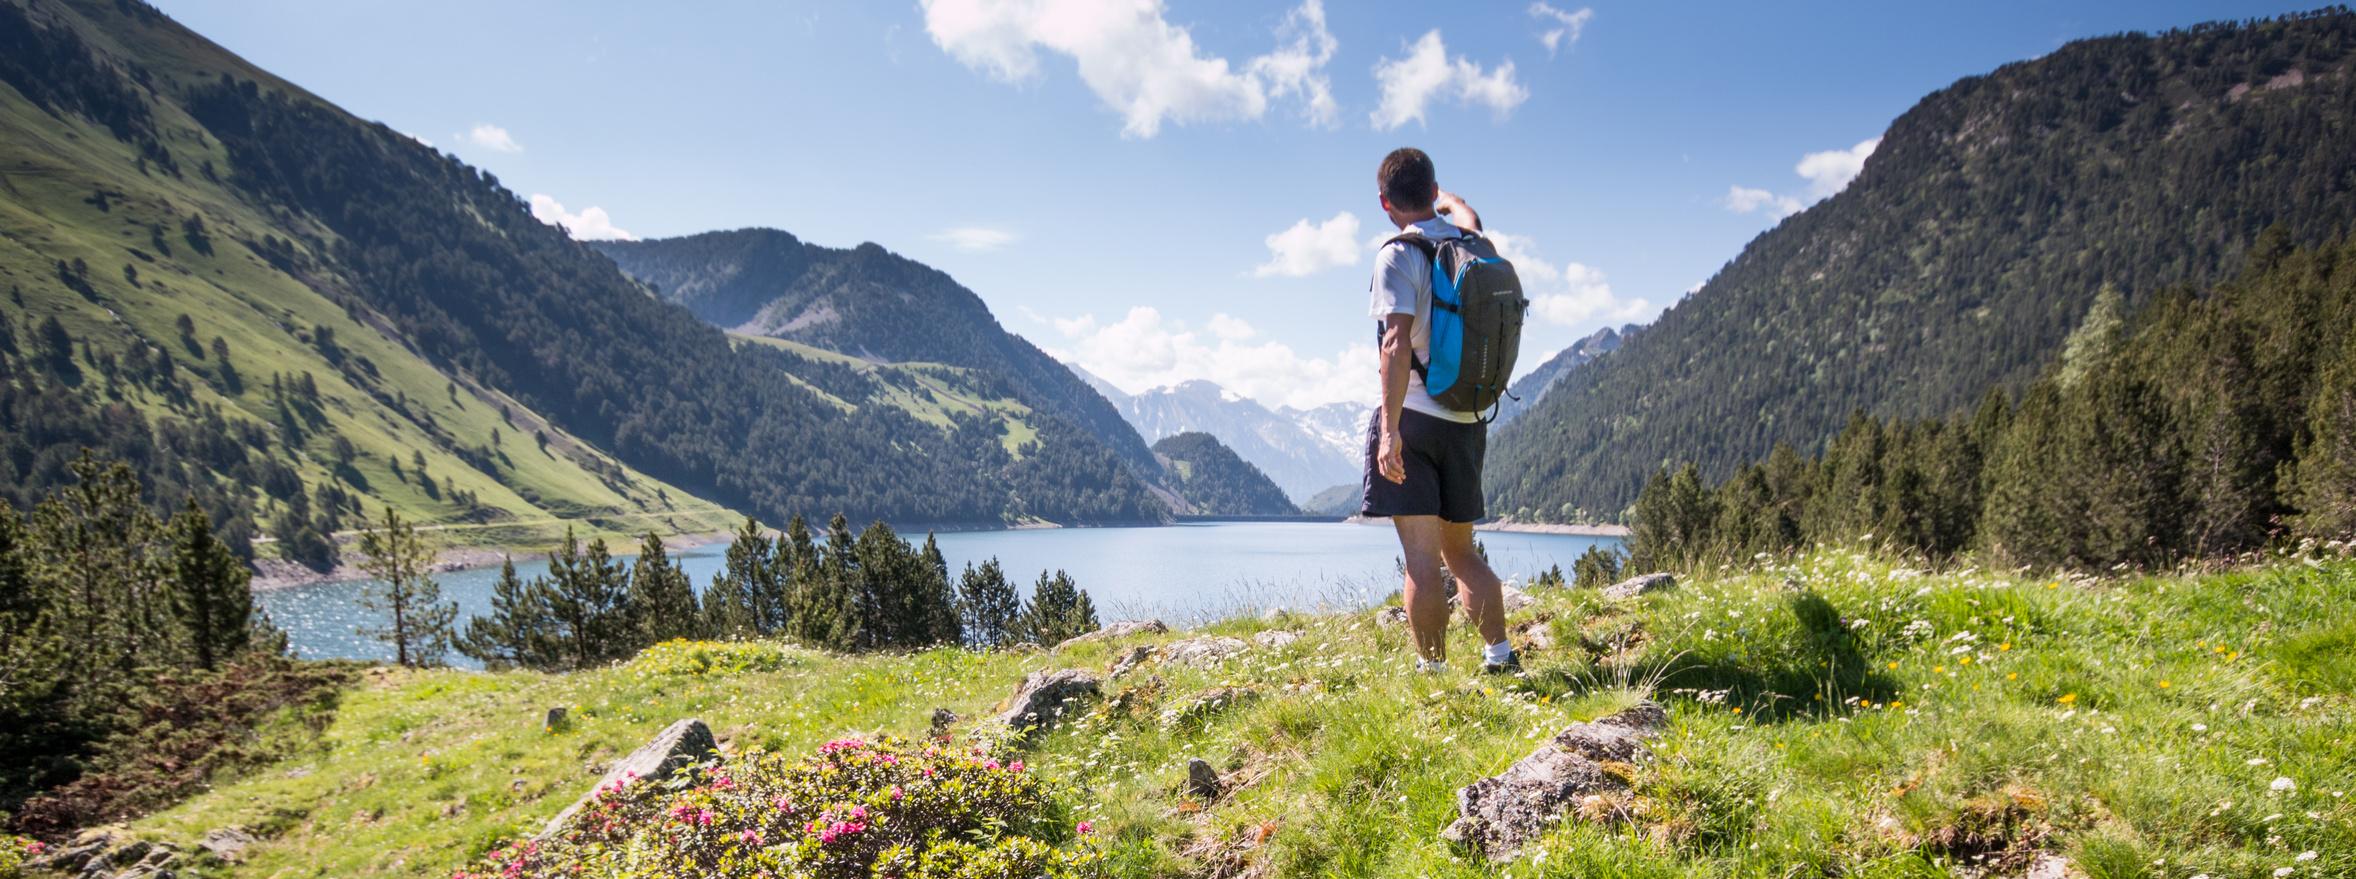 guide du tourisme en pyr n es pyr n es online